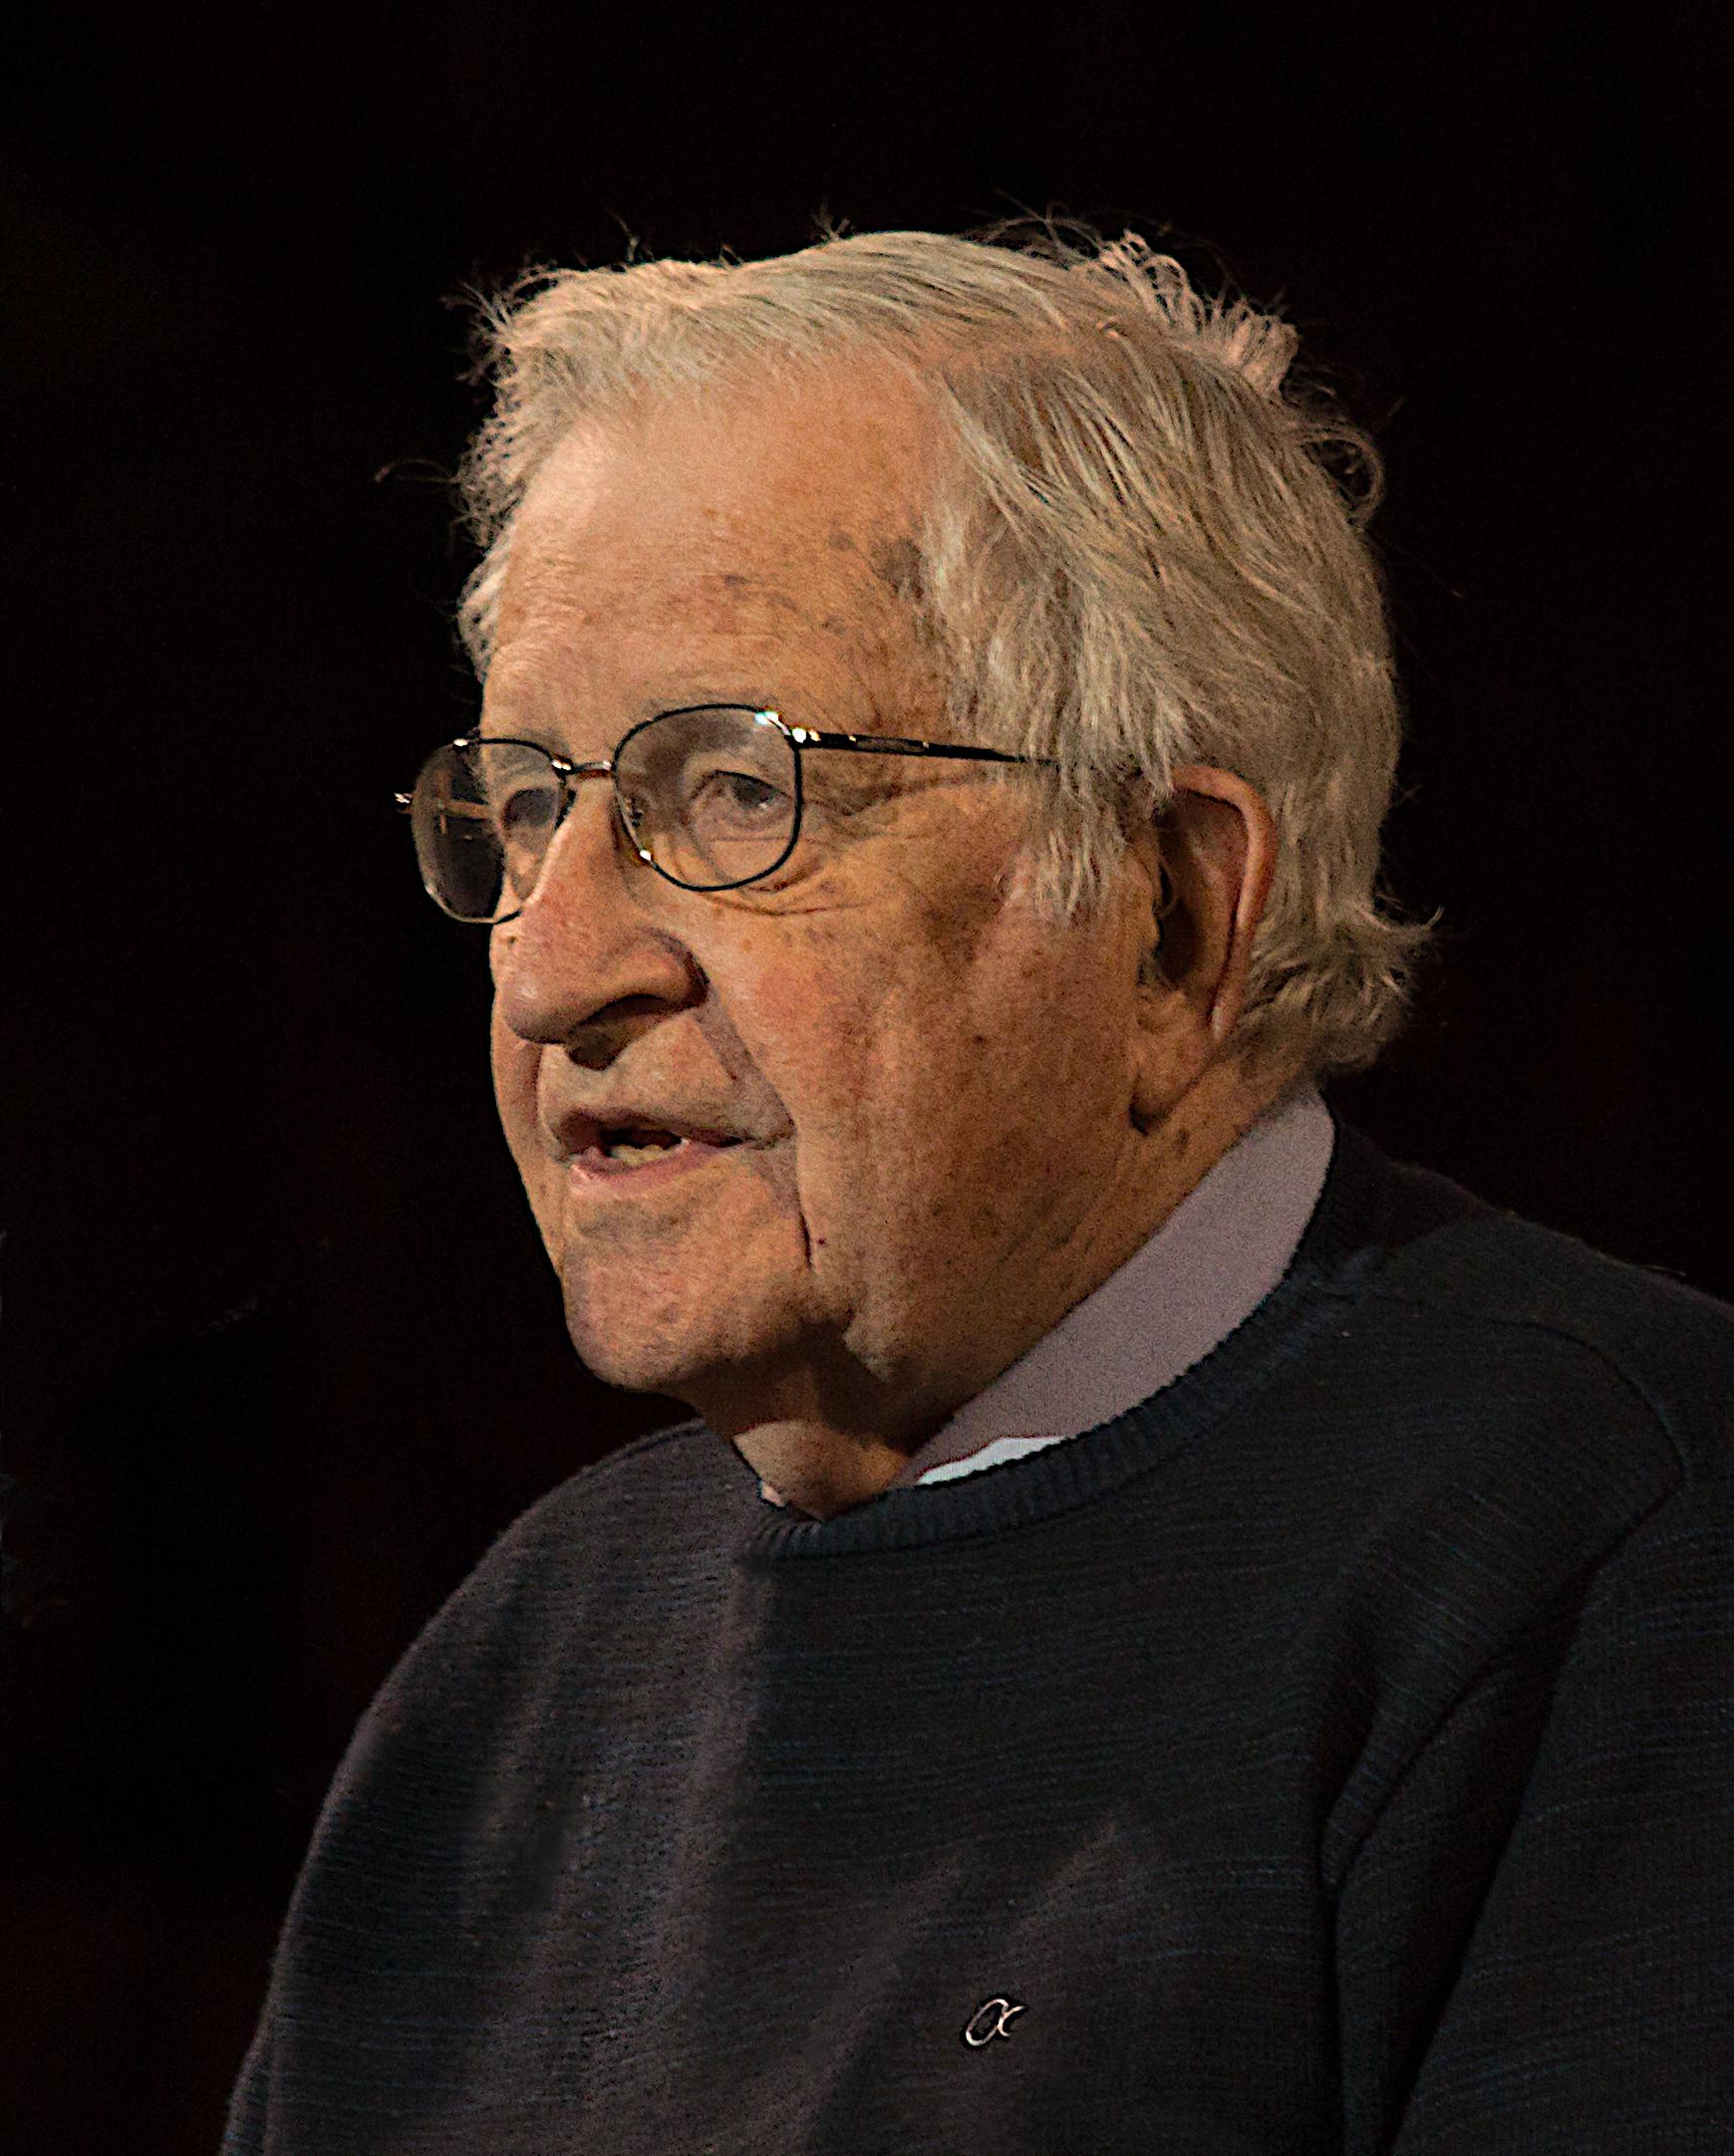 Government destroying secular democracy: Noam Chomsky